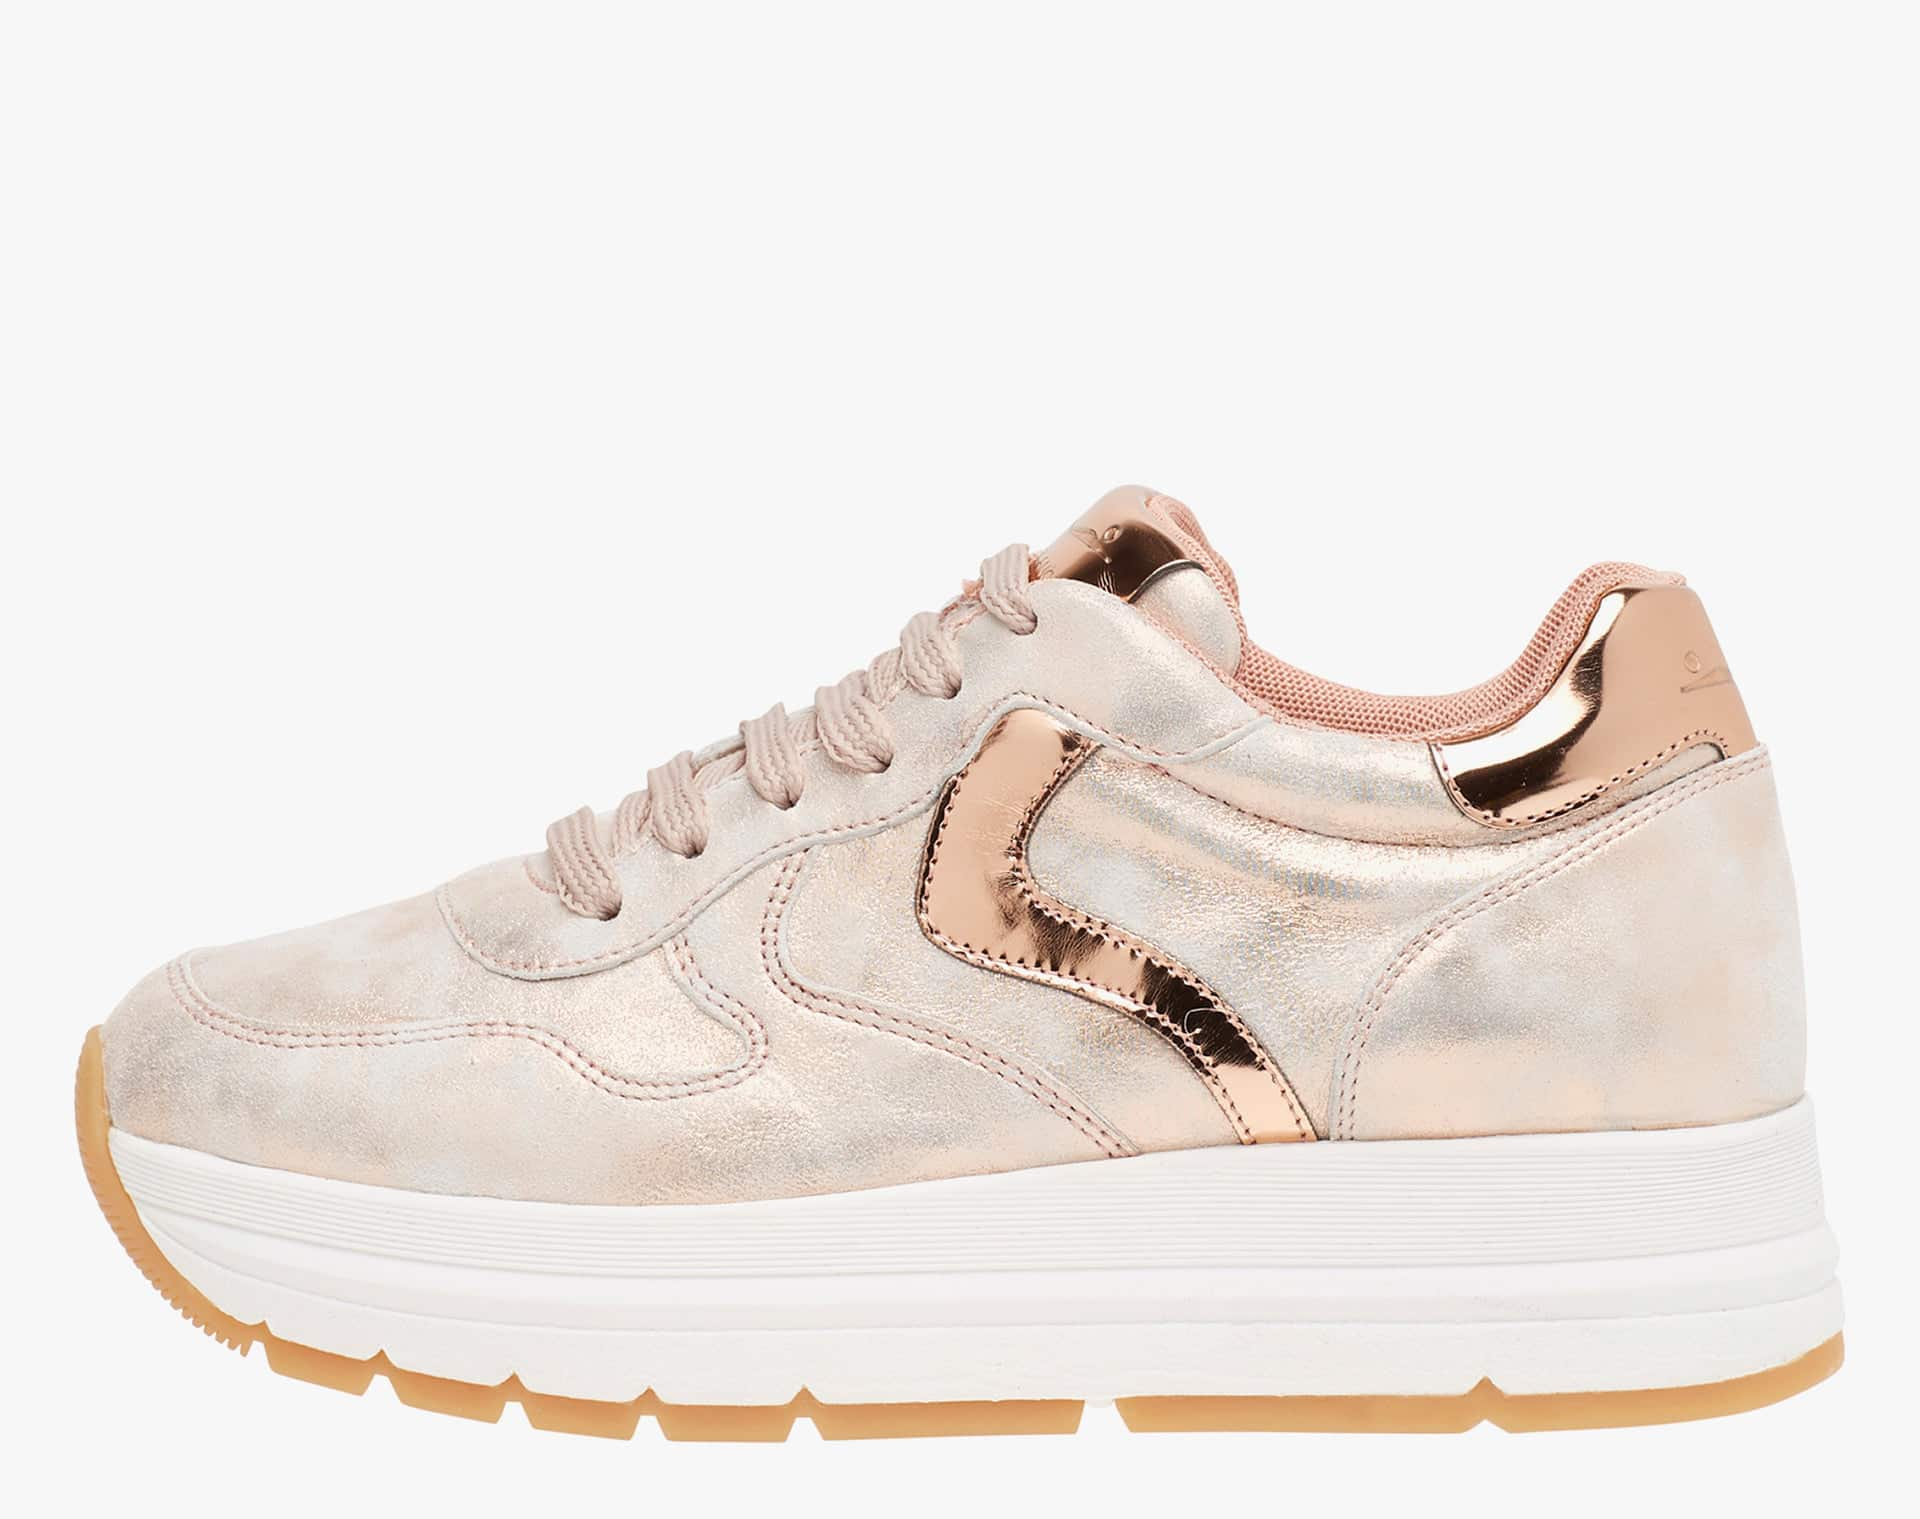 MARAN - Sneaker in vitello laminato ros� - Rosa